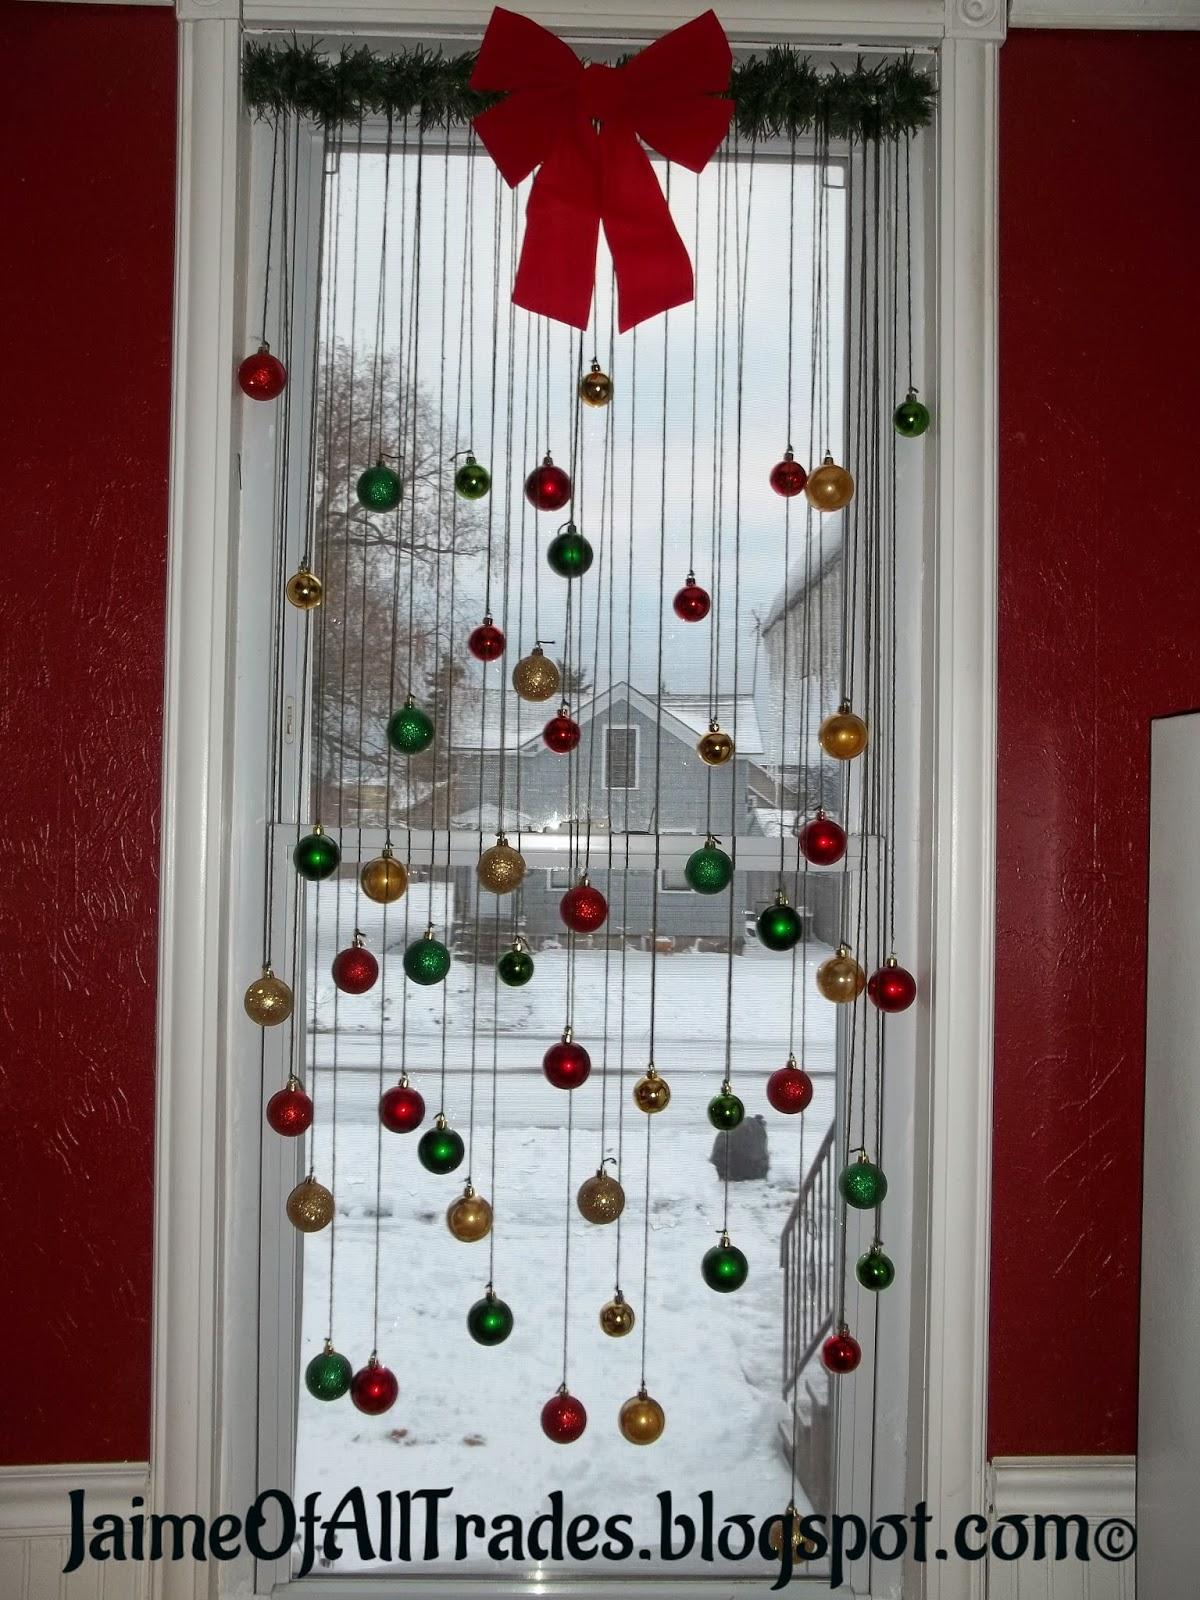 Jaime of All Trades: DIY Christmas Window Decorations